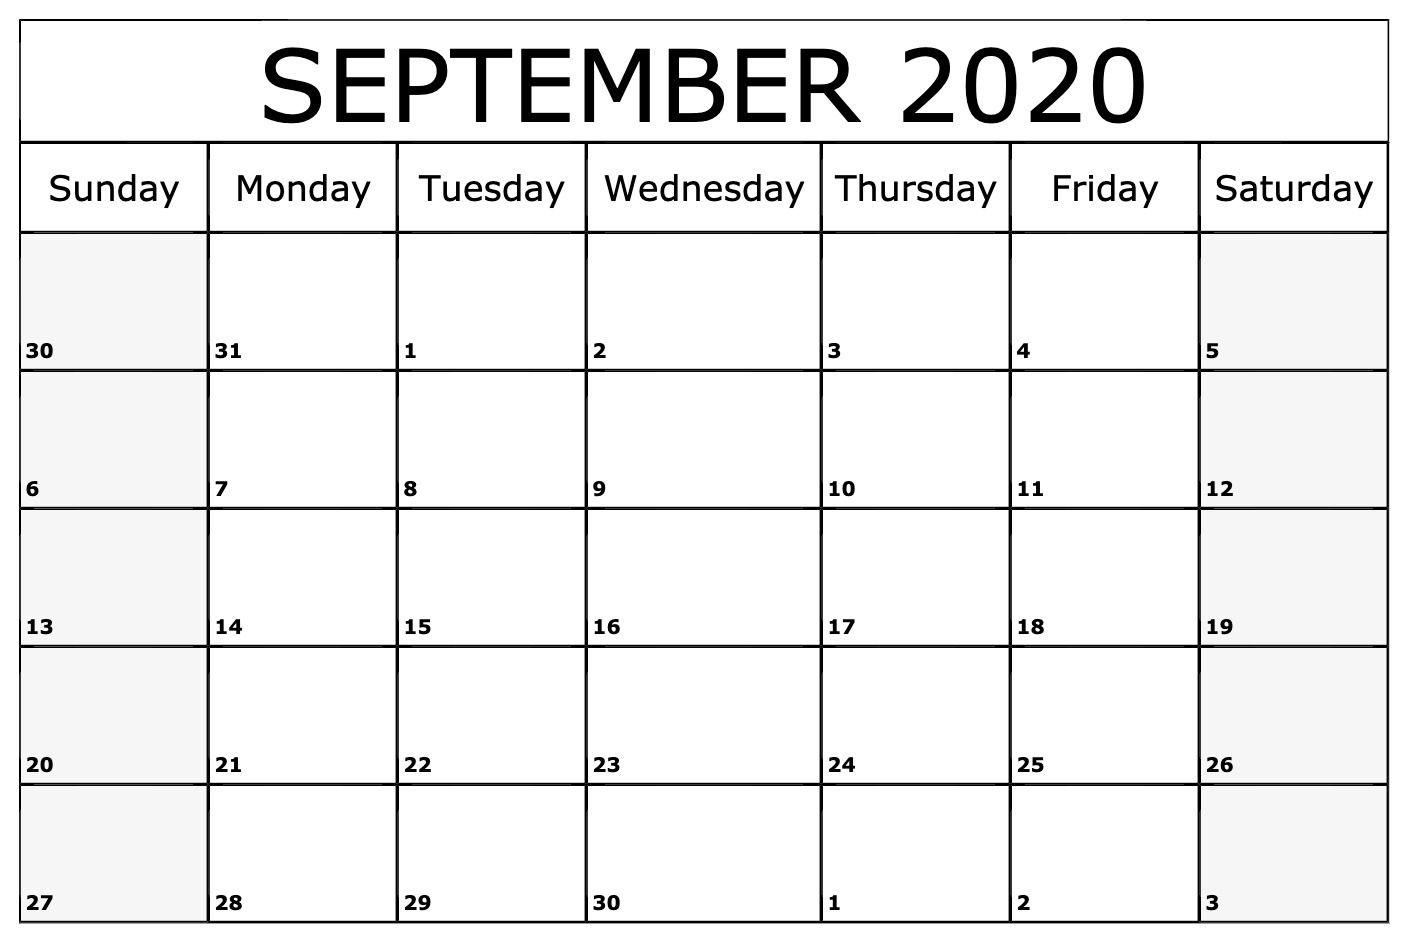 September 2020 Calendar Printable Template | Printable